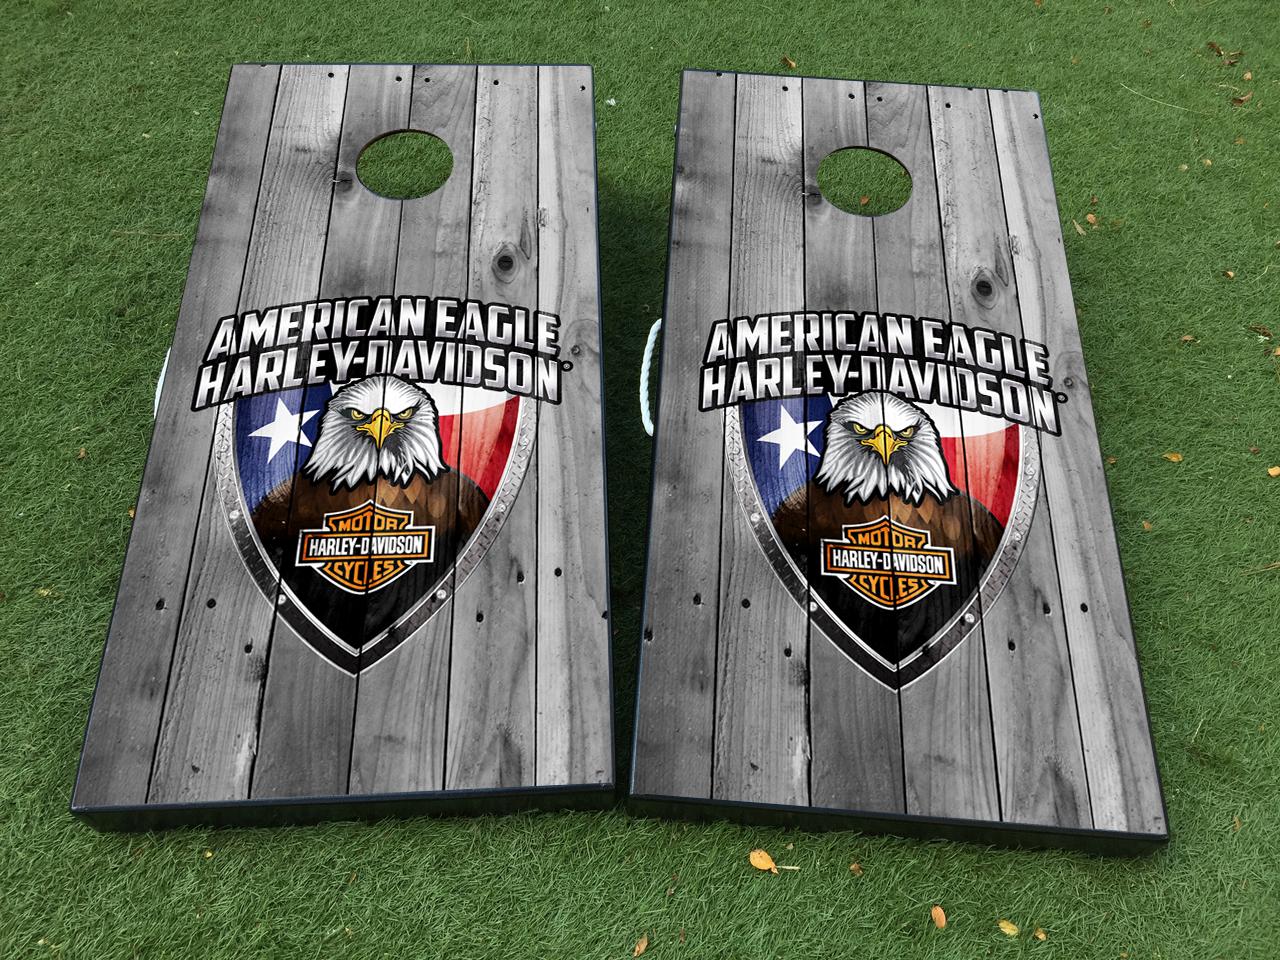 American eagle harley davidson usa cornhole board game decal vinyl wraps with laminated